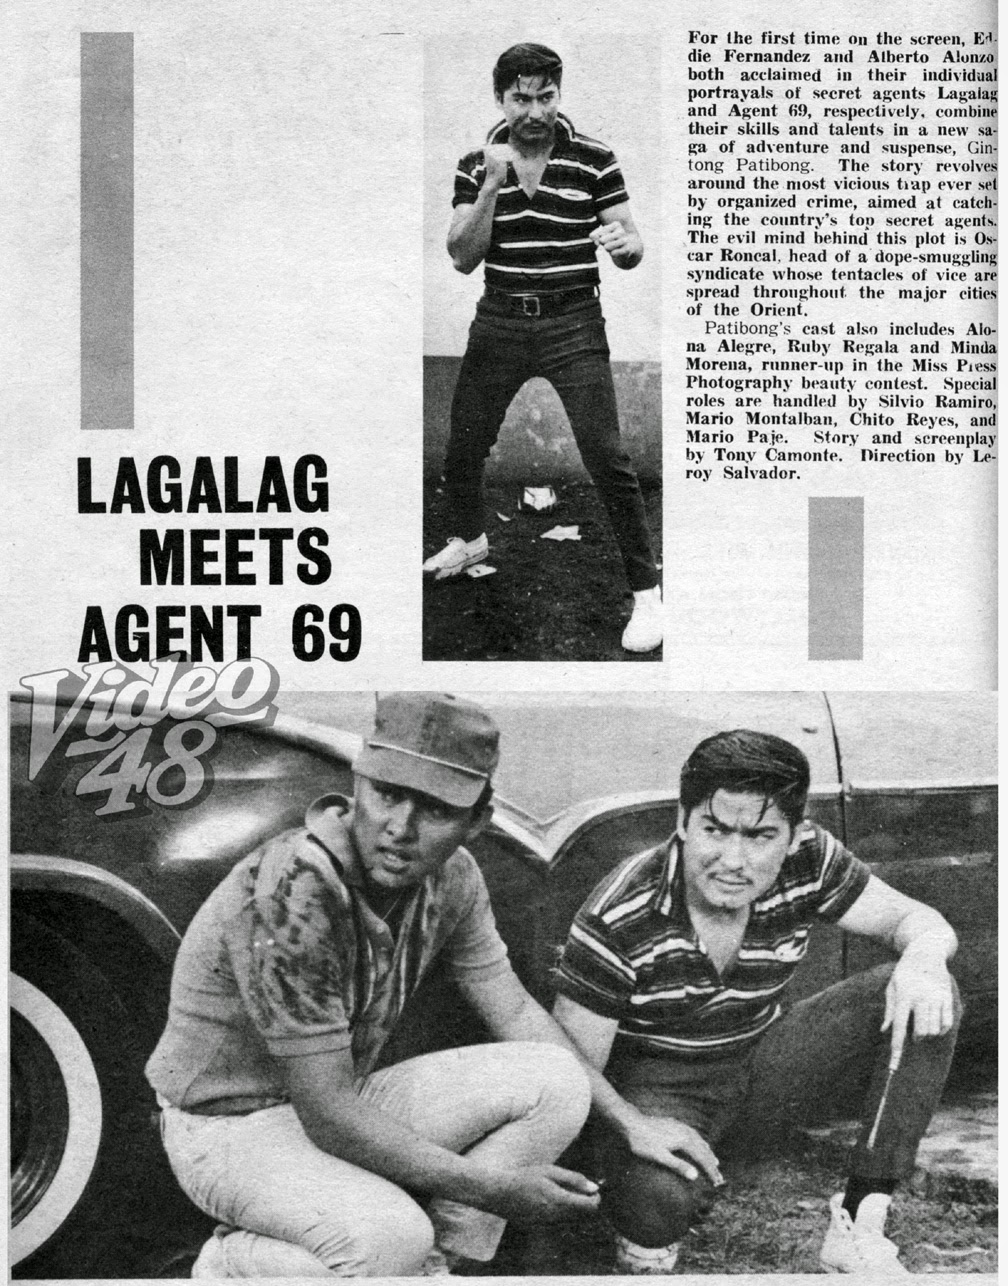 agent 69 jensen